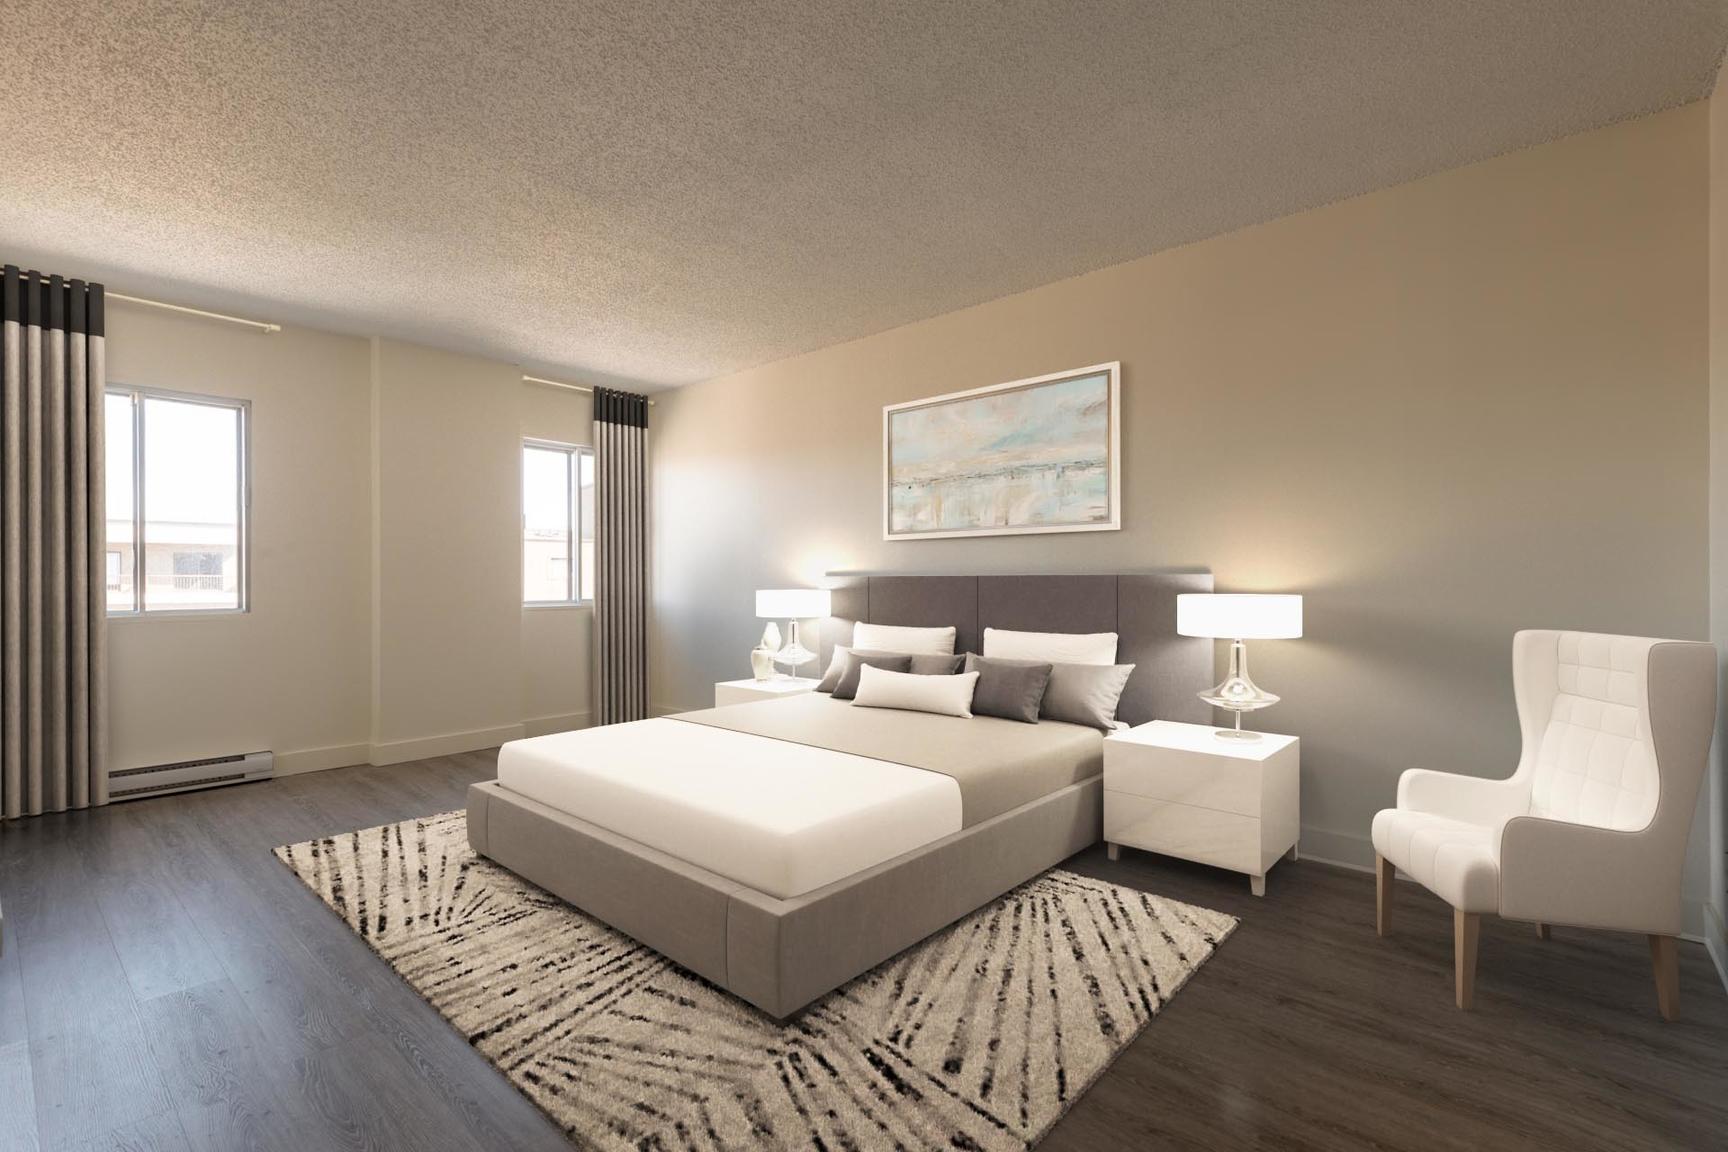 1 bedroom Apartments for rent in Ville St-Laurent - Bois-Franc at Complexe Deguire - Photo 11 - RentQuebecApartments – L407181